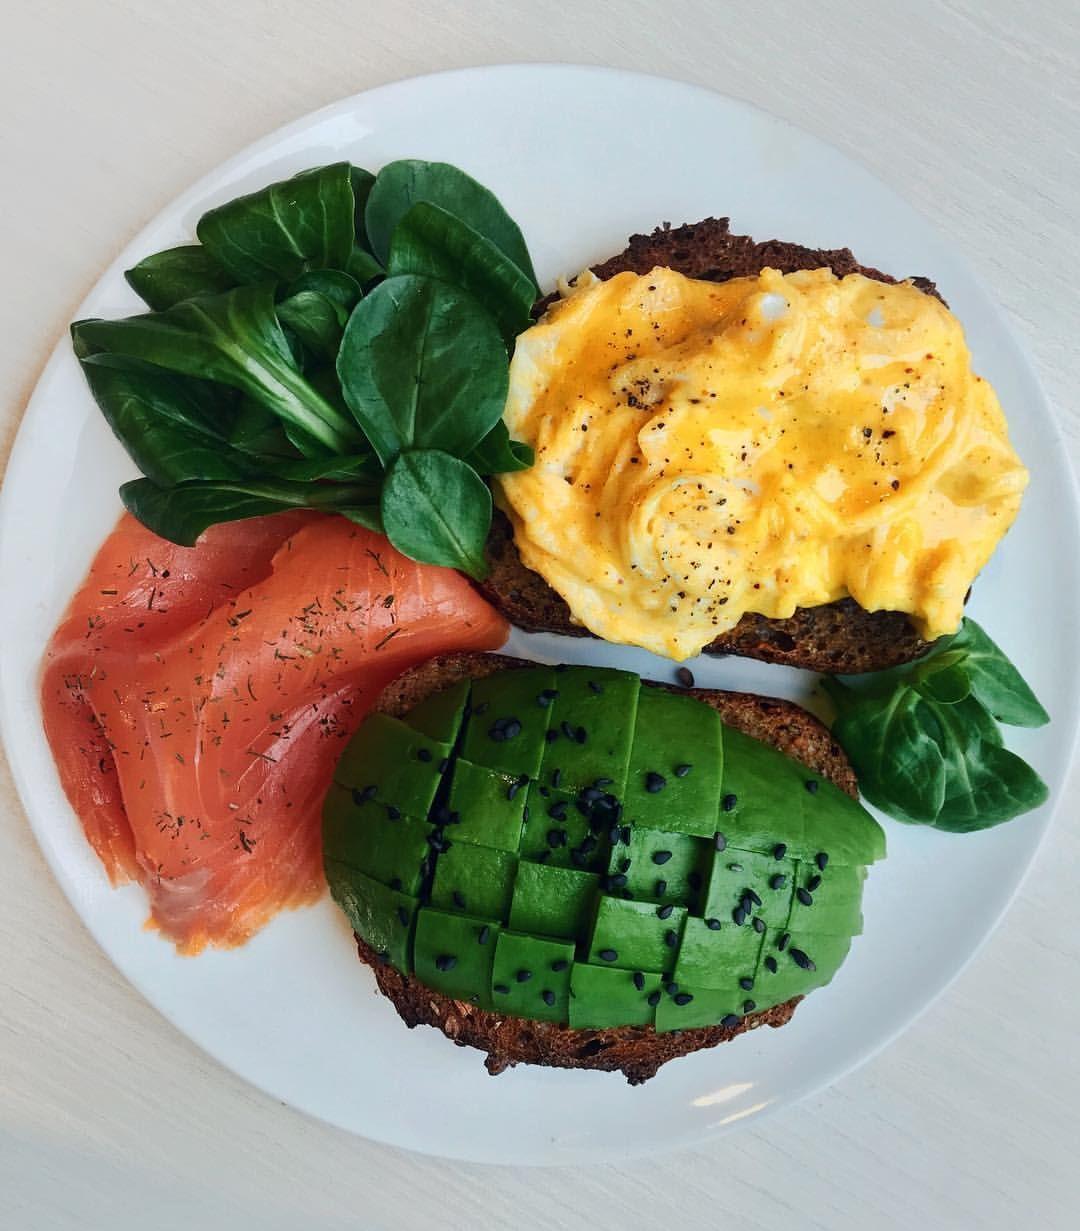 Ham And Avocado Scramble Recipe: Smoked Salmon Avocado Scrambled Eggs Spinach And Toast